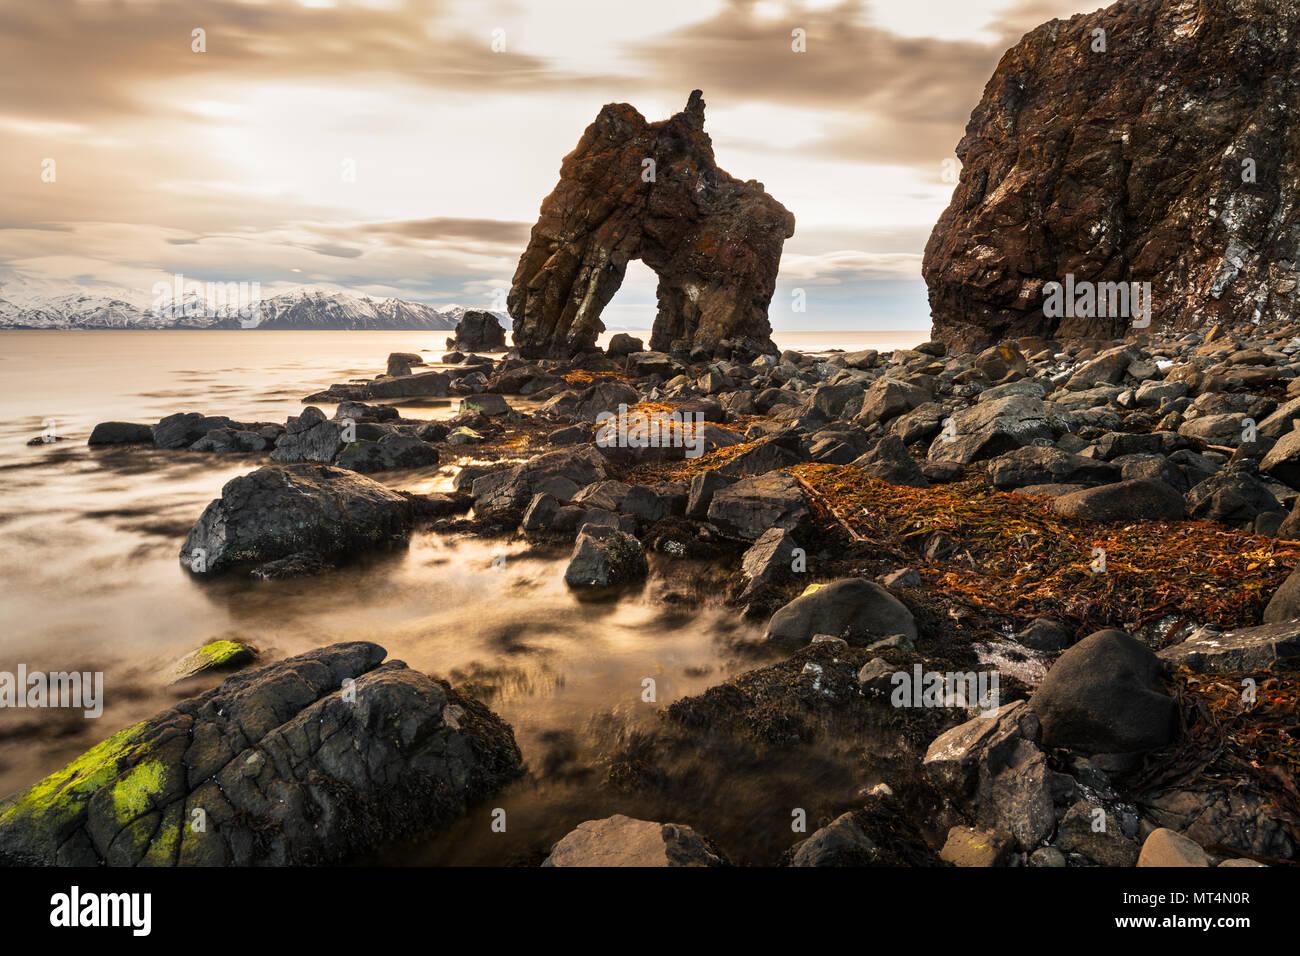 Gatanöf rock arch on the north coast of Iceland, close to Húsavík. - Stock Image